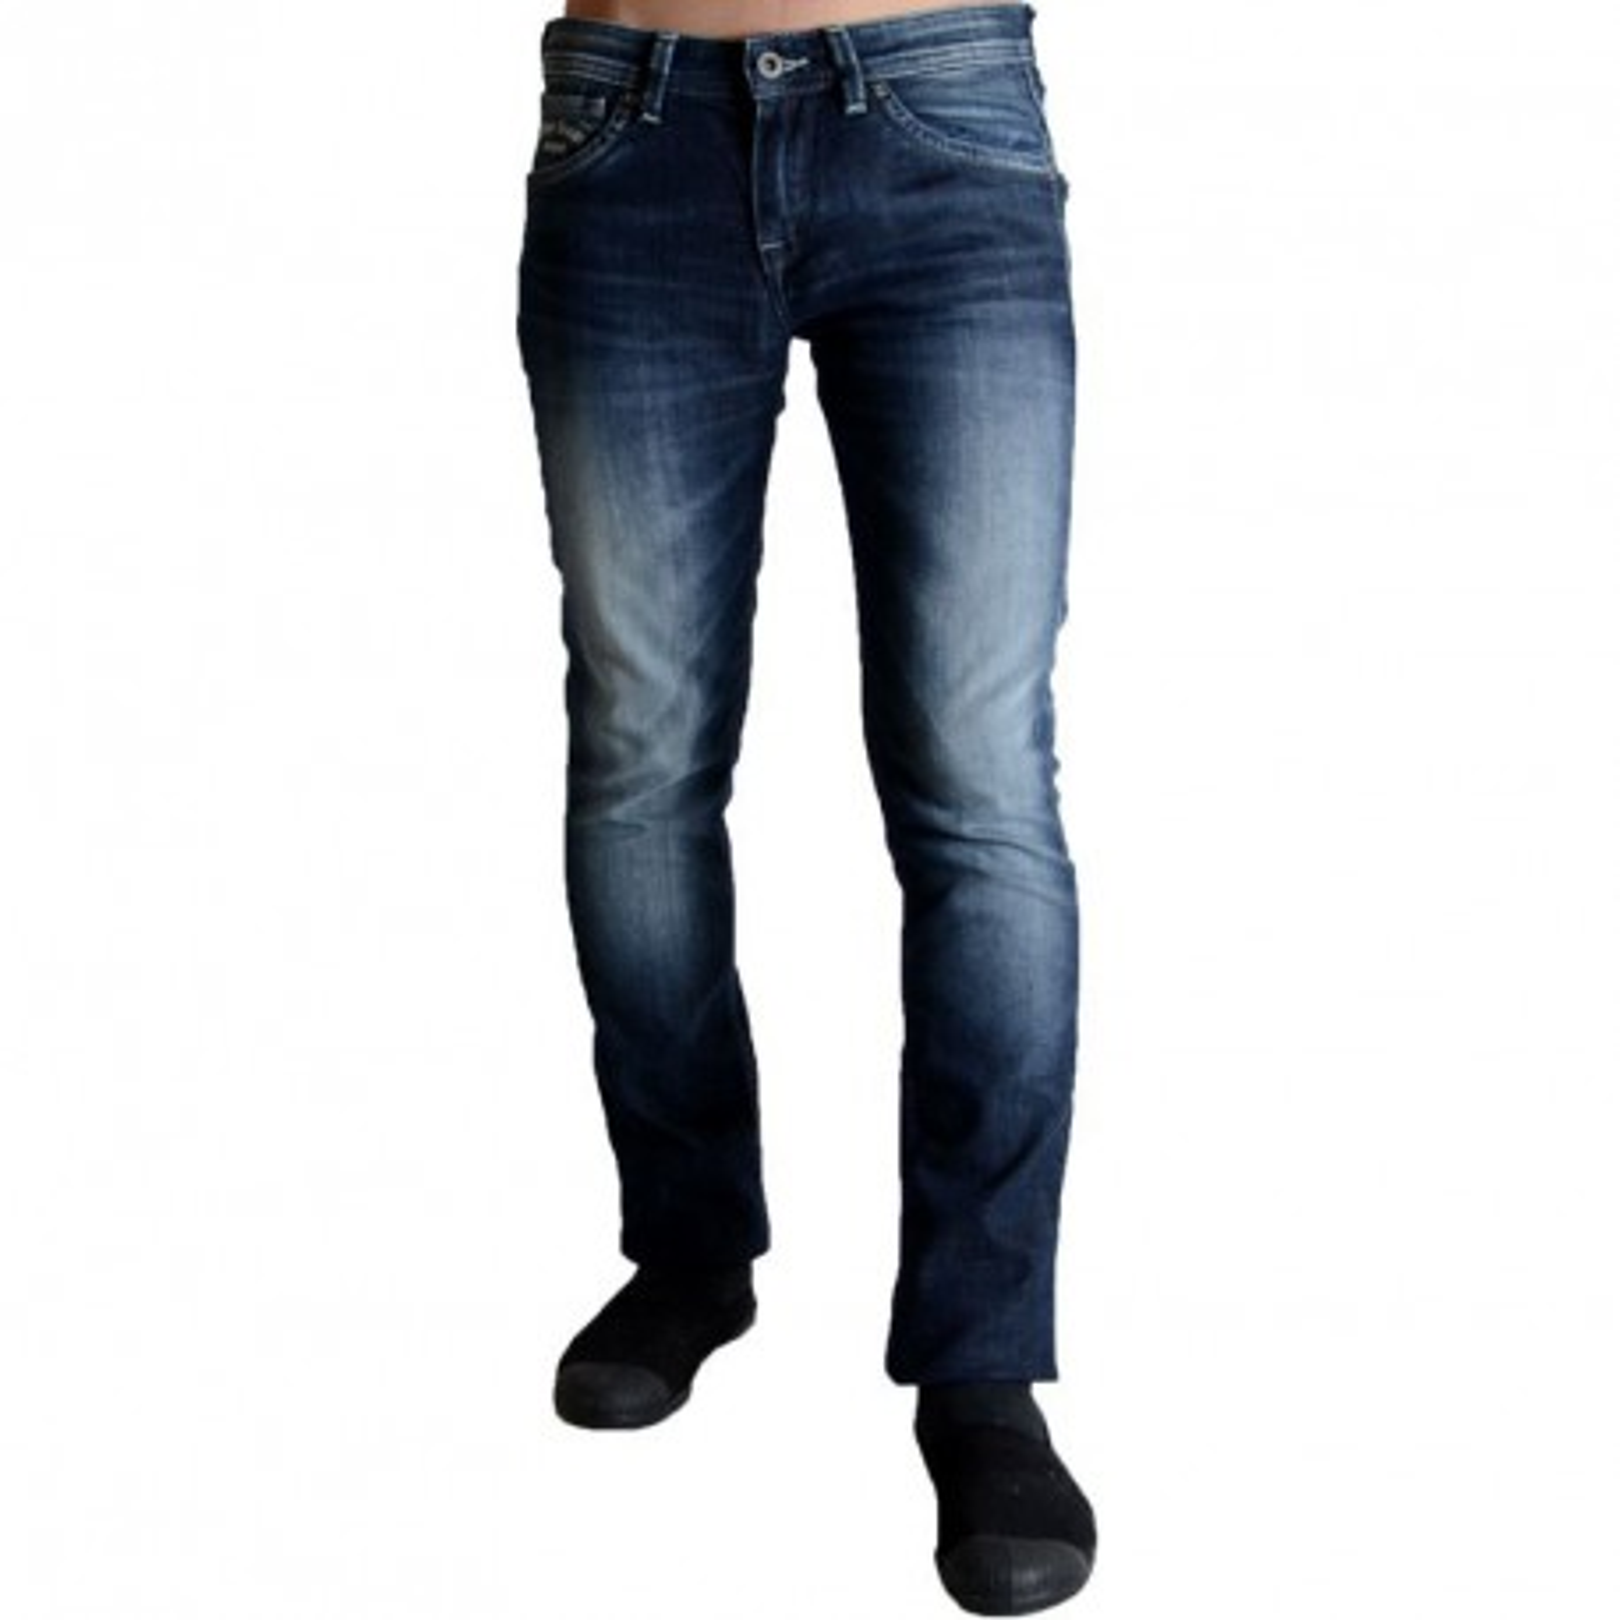 Jeans Pepe Jeans Enfant Cashed PB200231R67